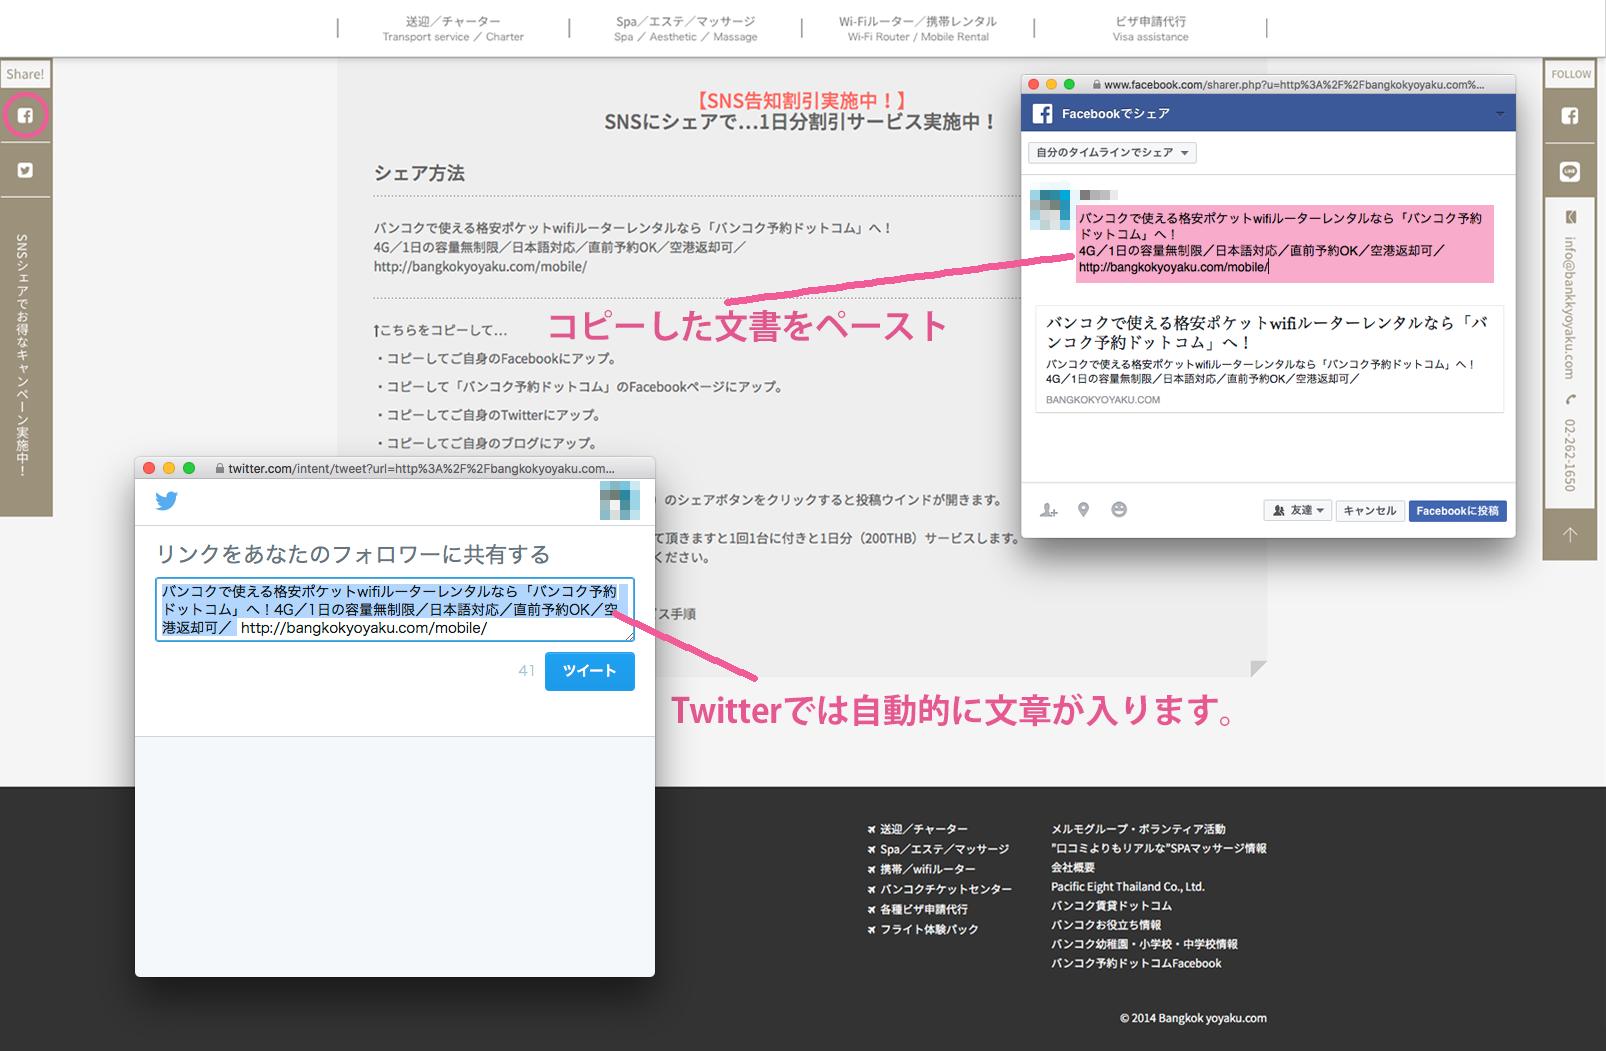 share_step3